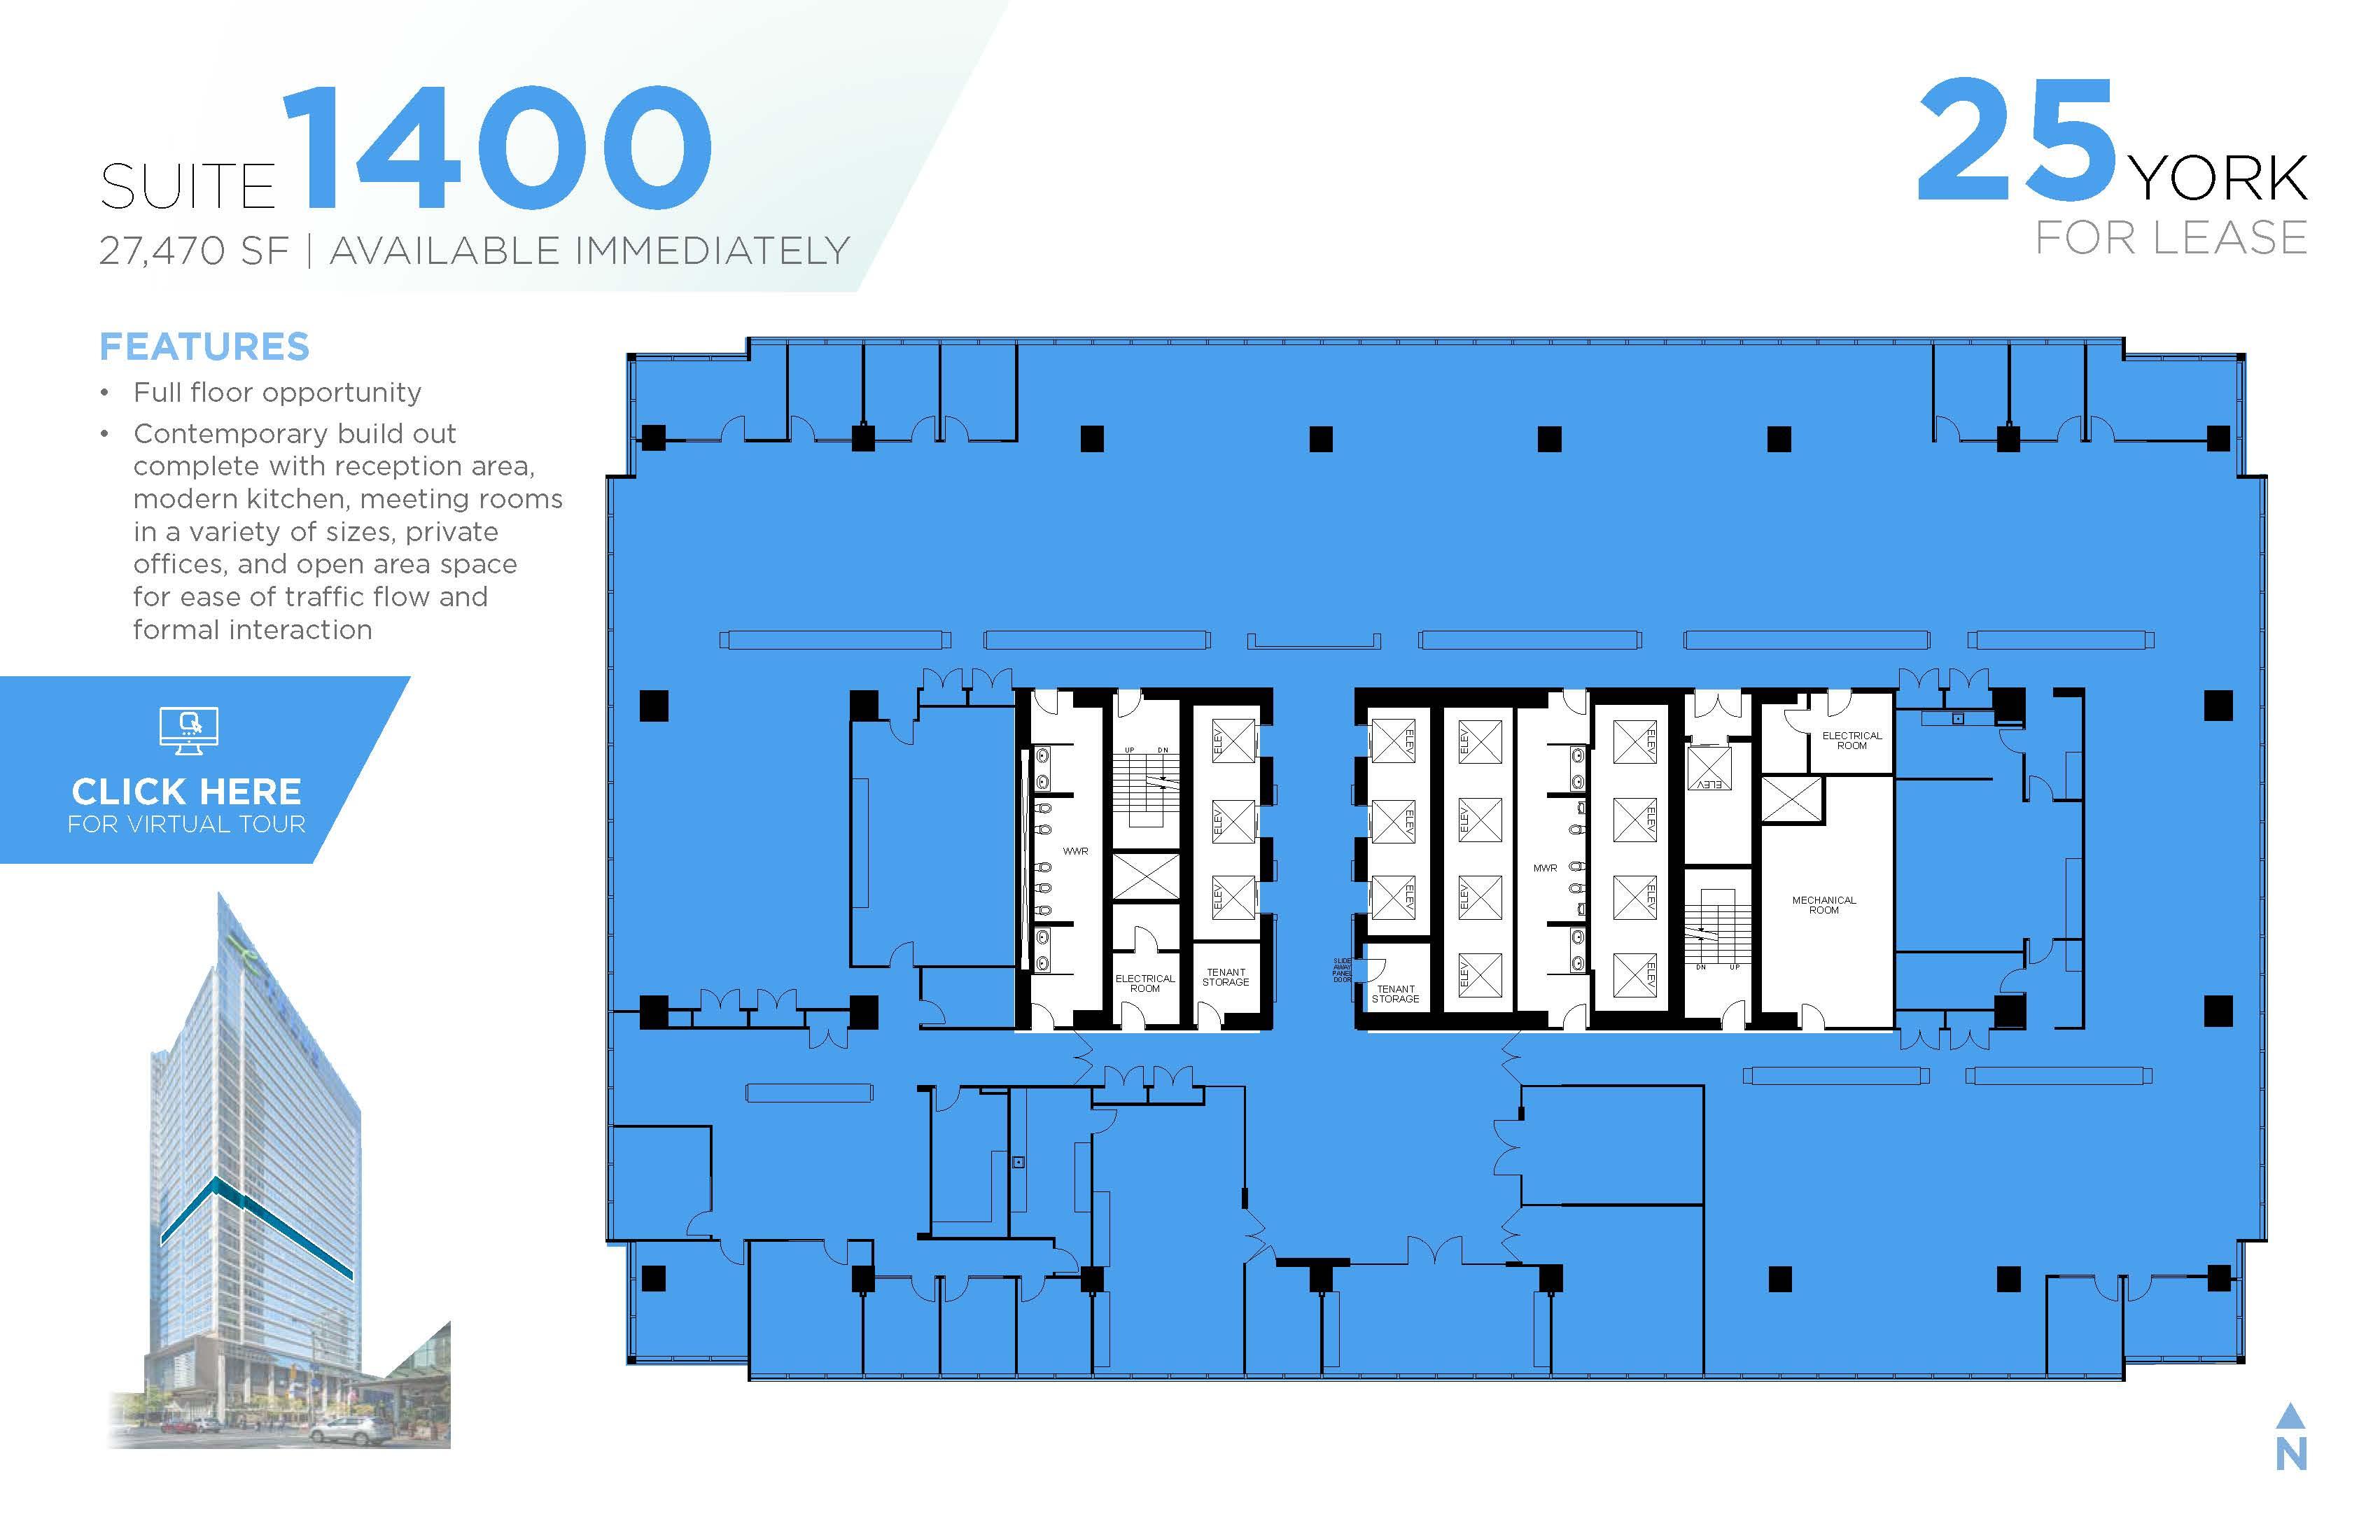 Floorplan thumbnail of Suite 1400